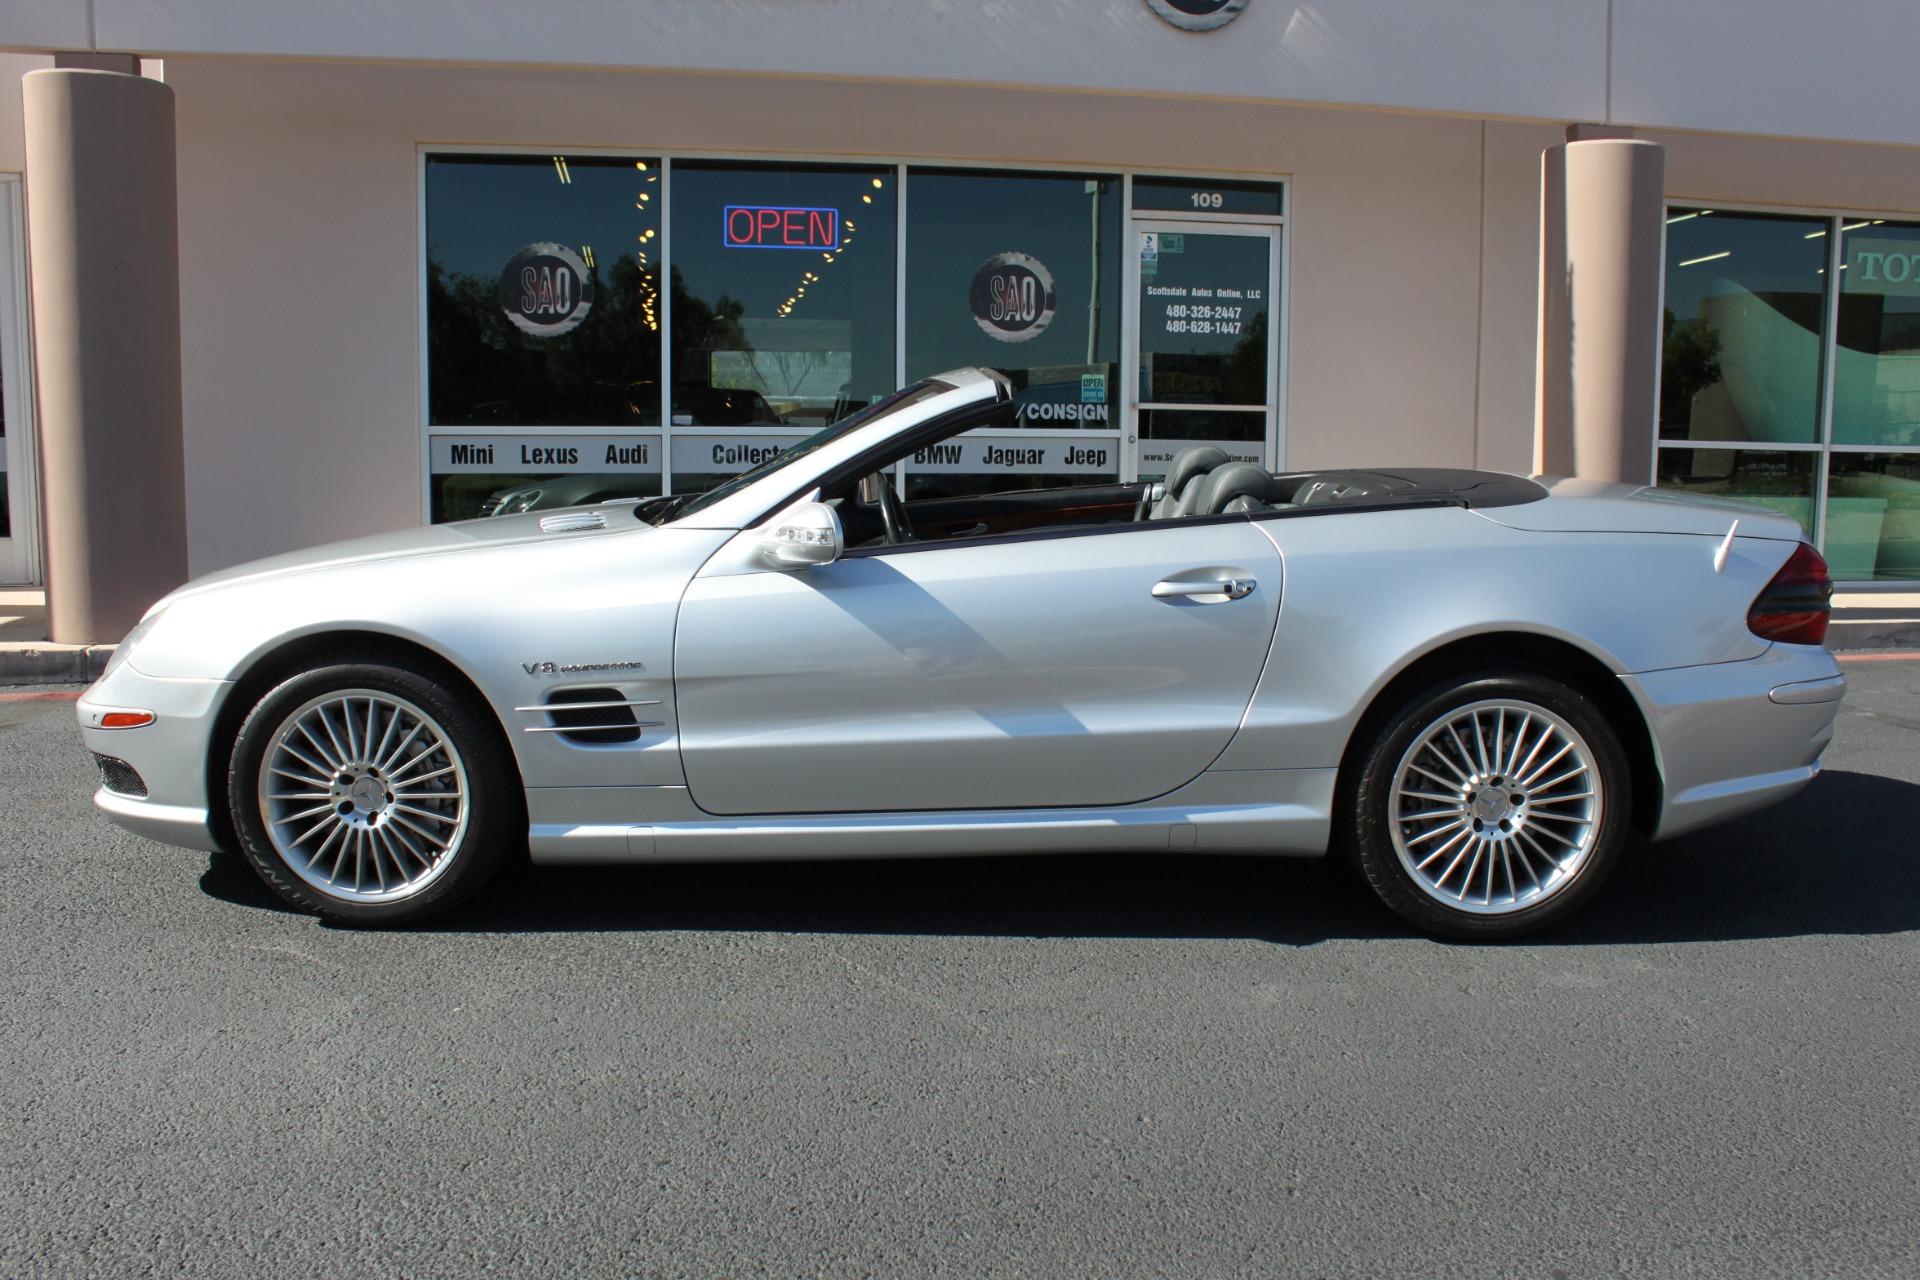 Used-2003-Mercedes-Benz-SL-Class-AMG-Wagoneer